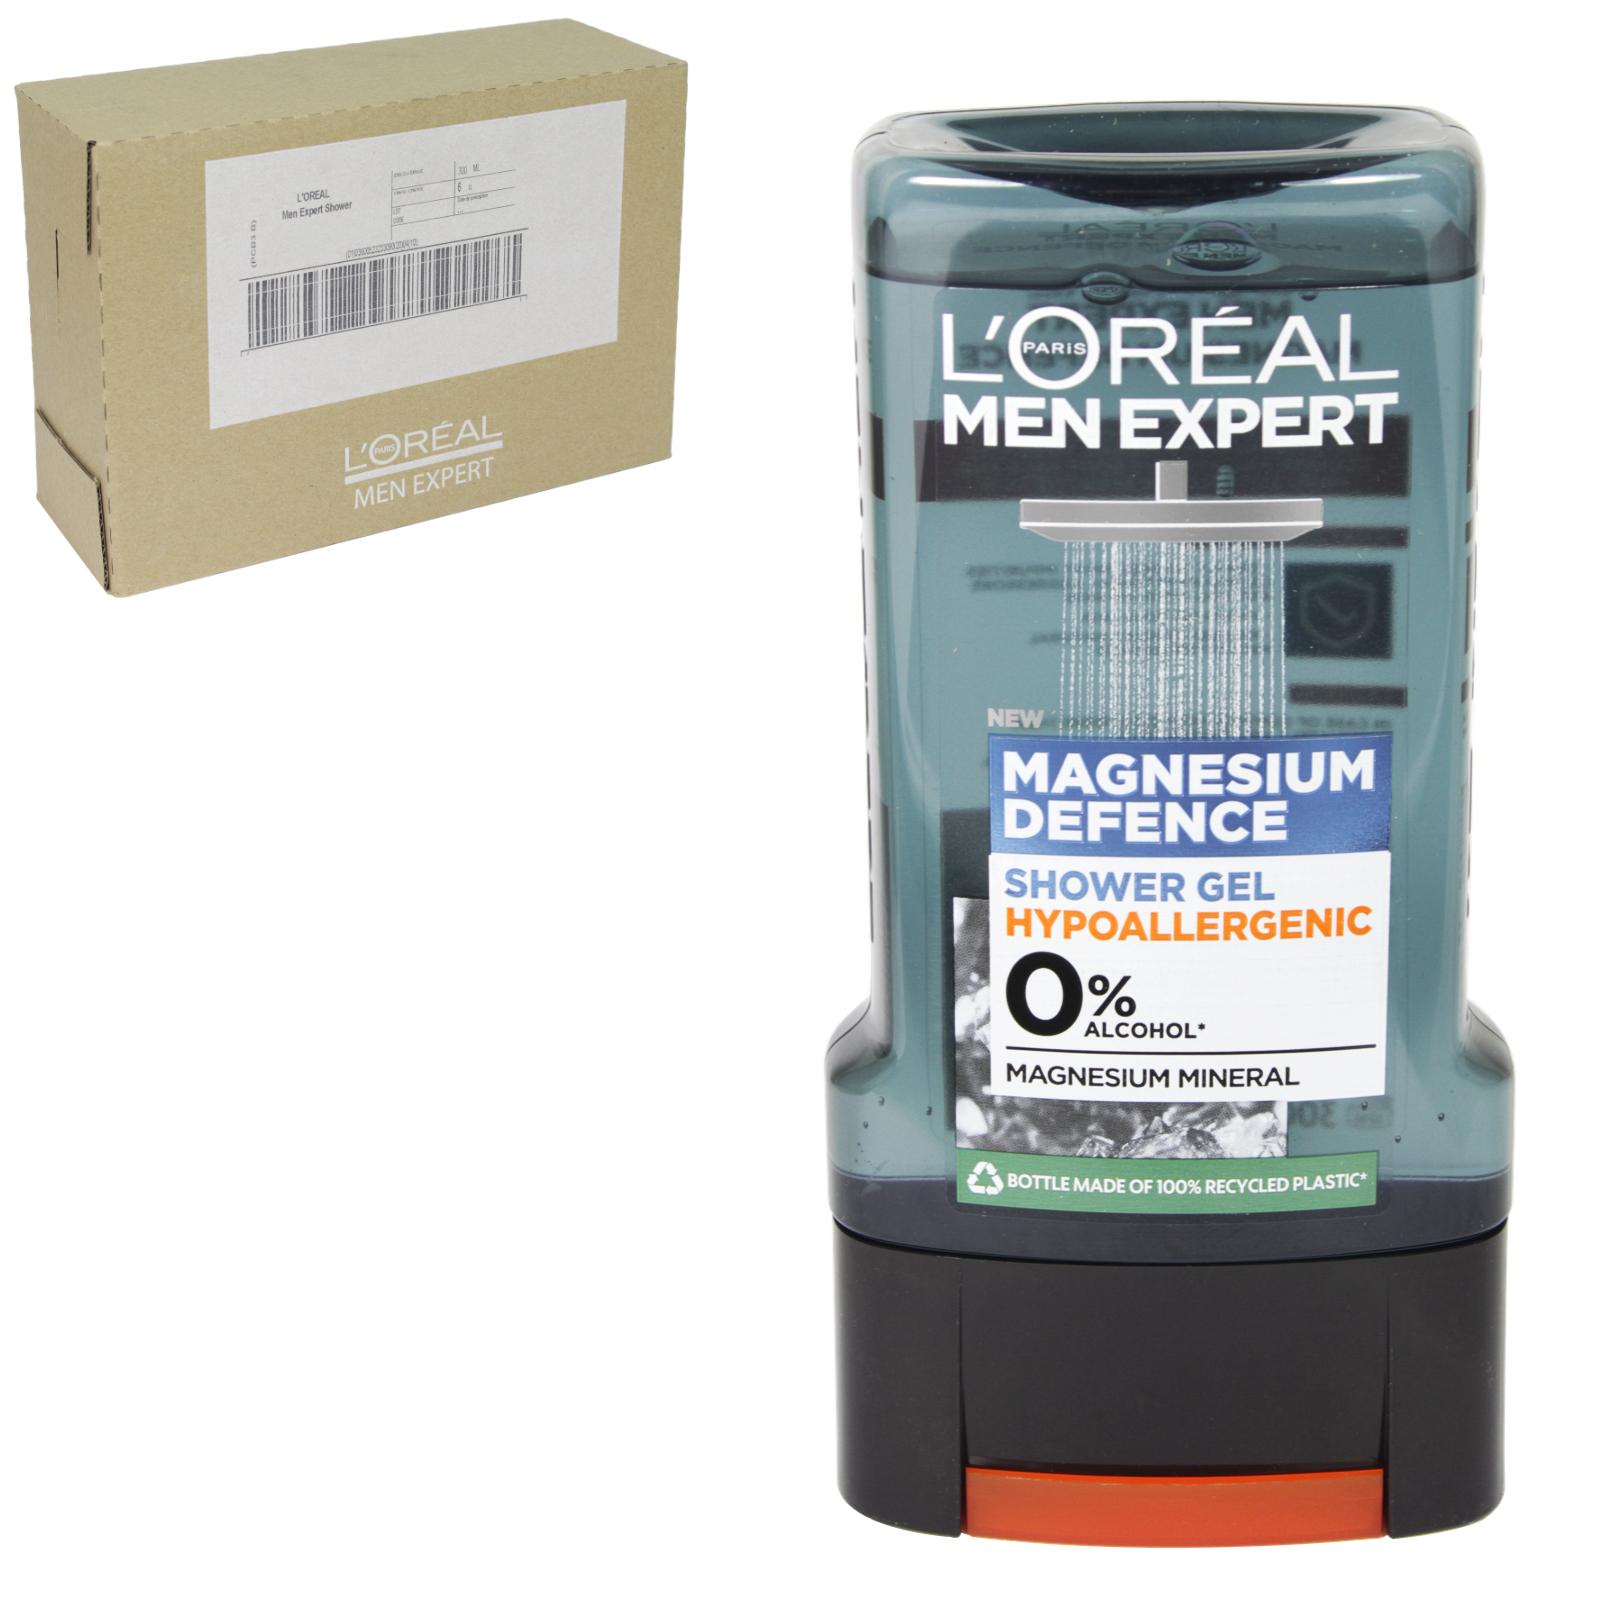 LOREAL MEN EXPERT SHOWER 300ML CLEAN POWER X6